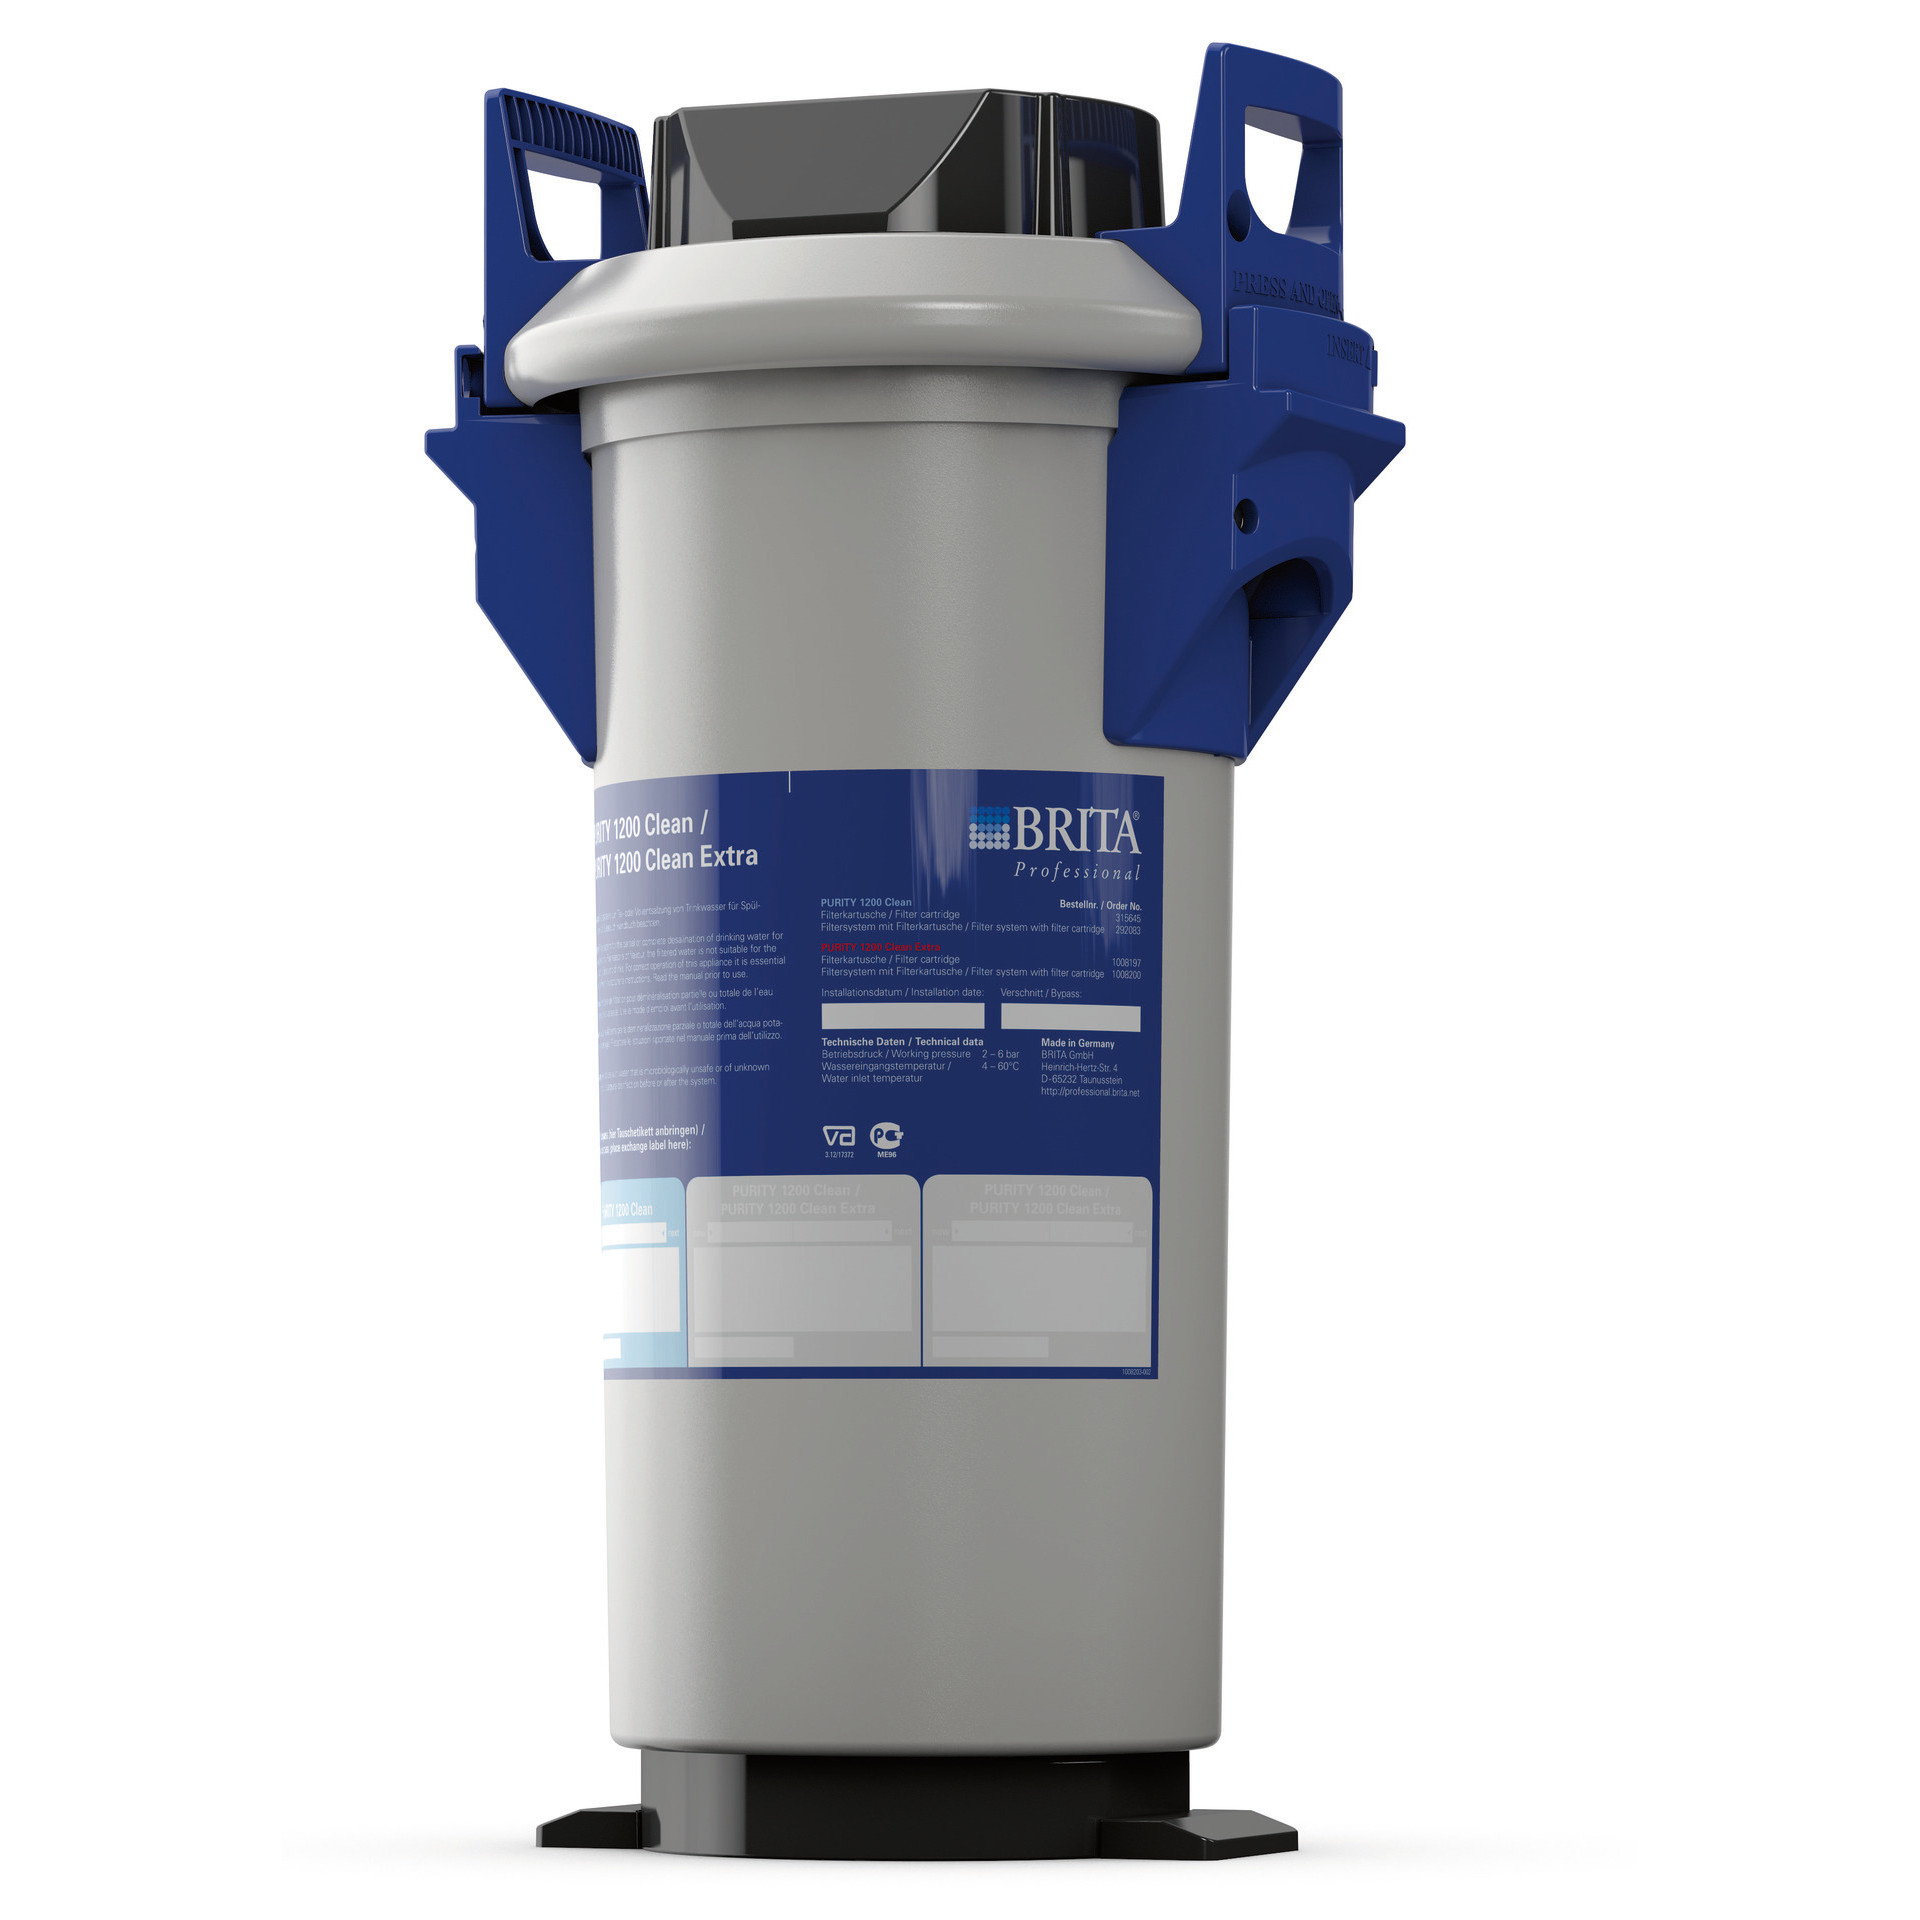 Komplettsystem Purity 1200 Clean / Teilentsalzung